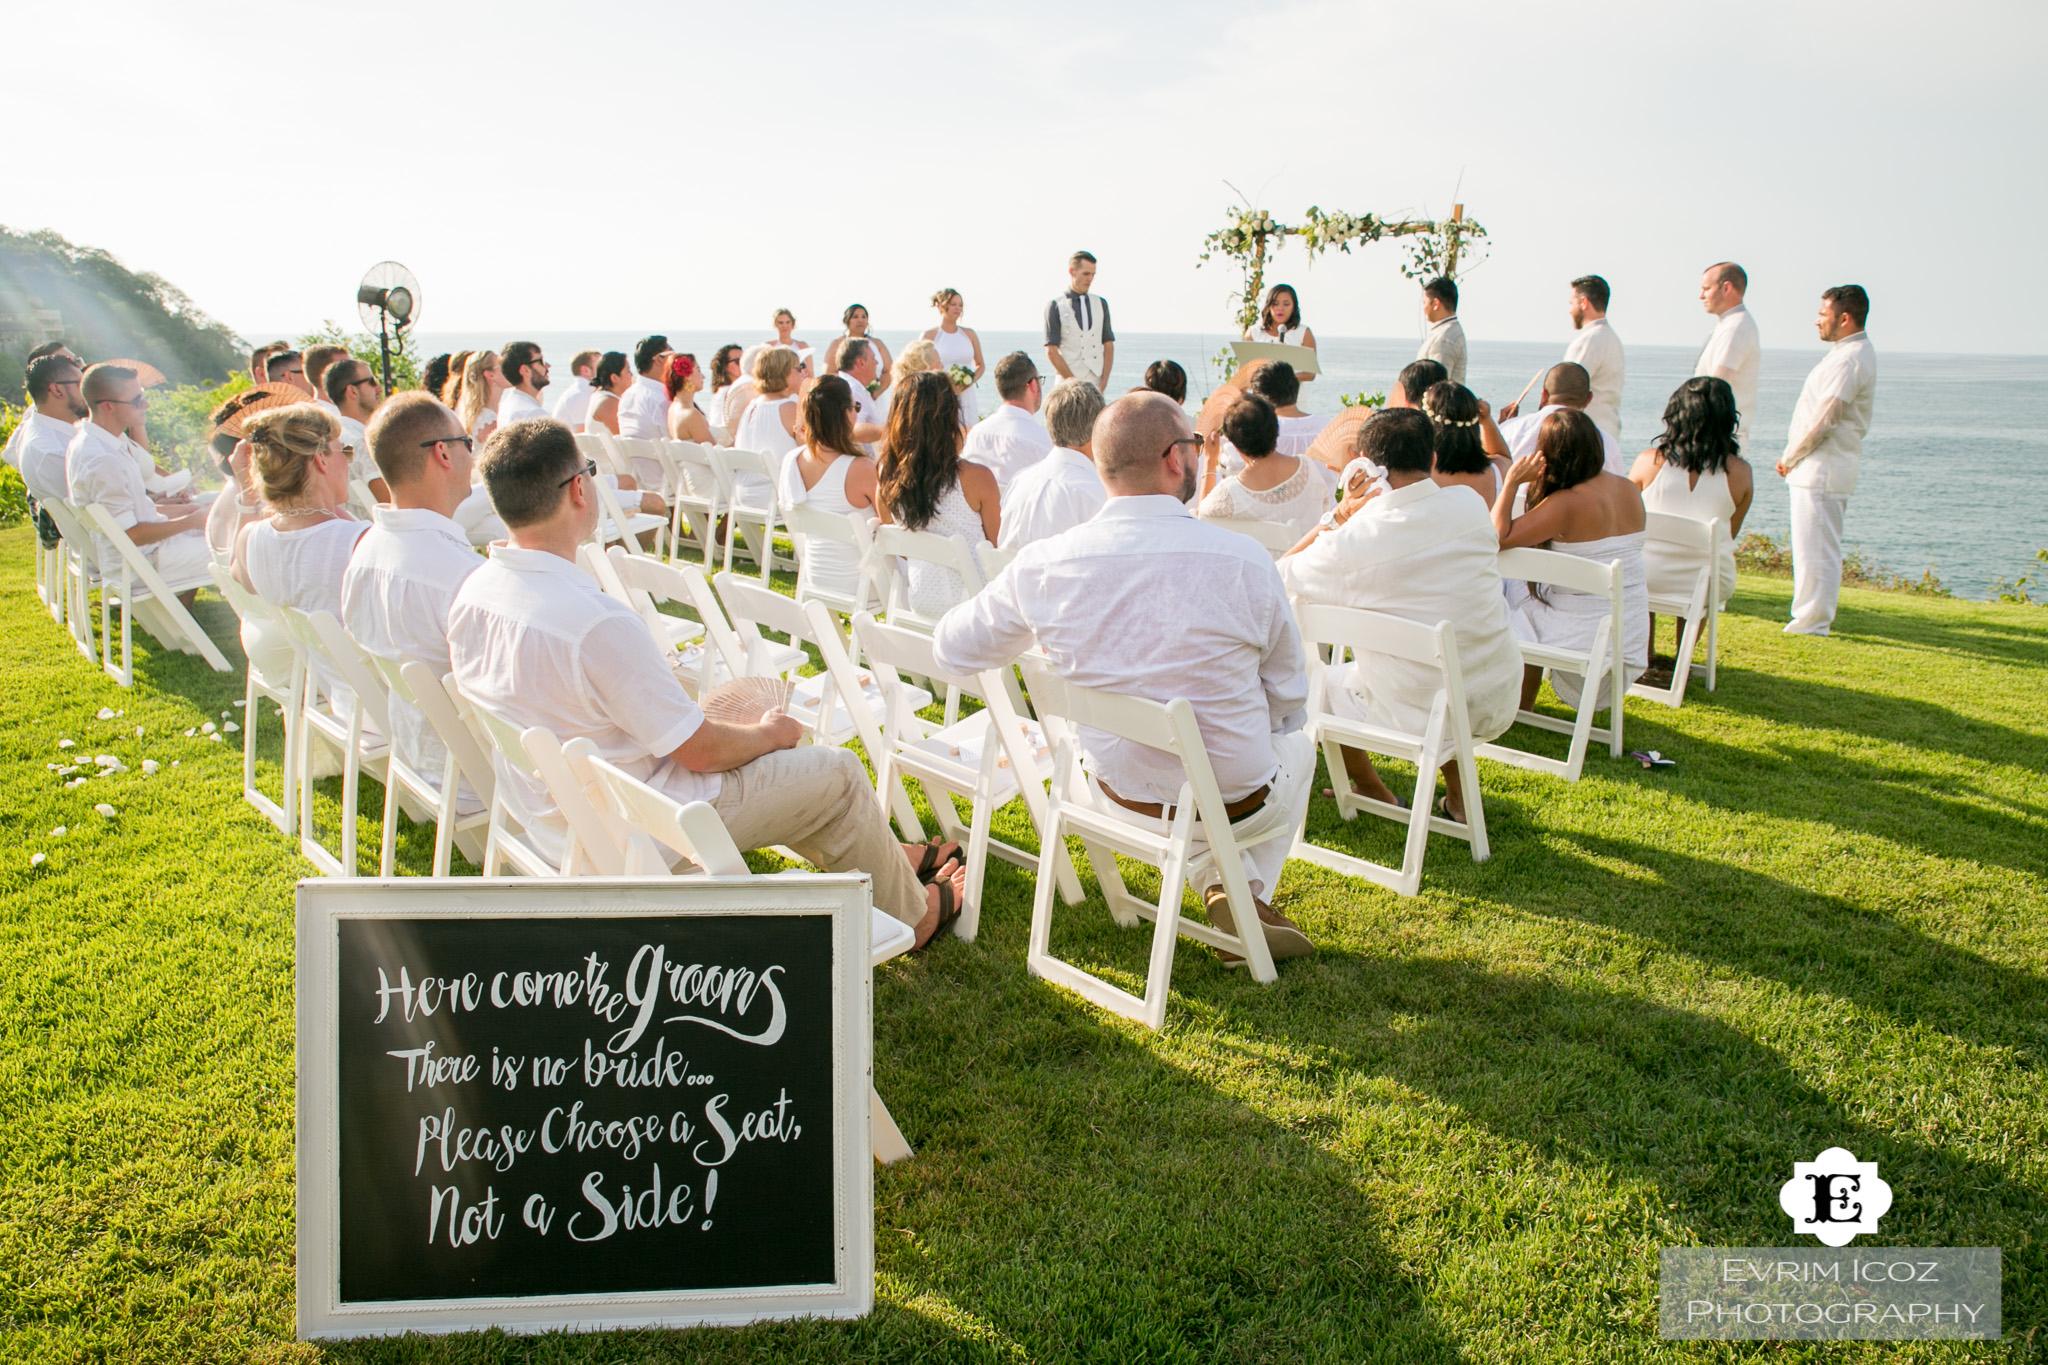 Jefferson + Patrick Wedding July 3 2016 - 6 of 10